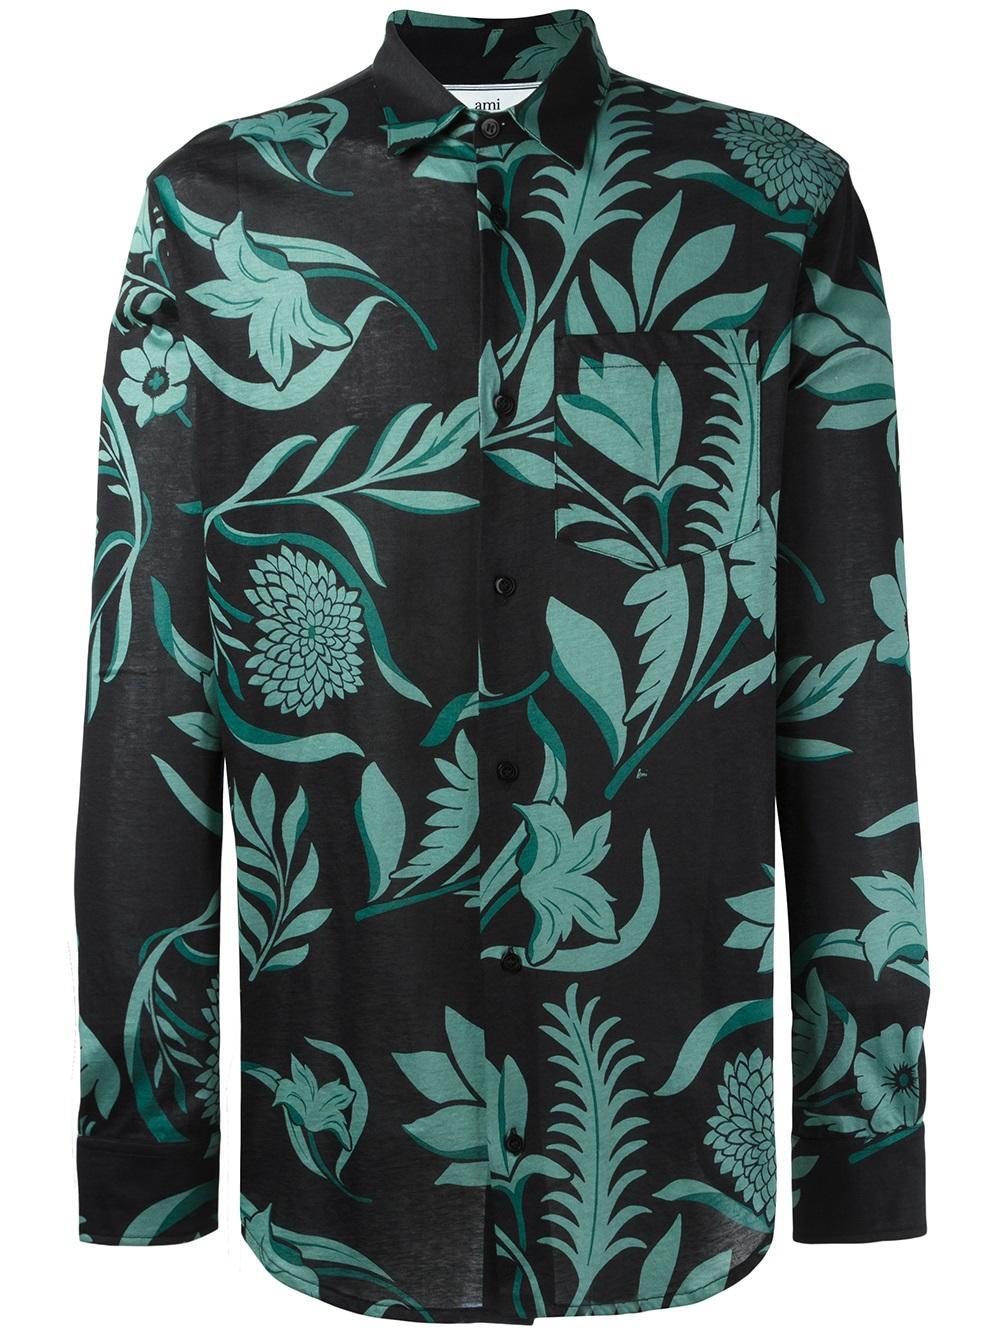 AMI Long Sleeve Black & teal floral shirt